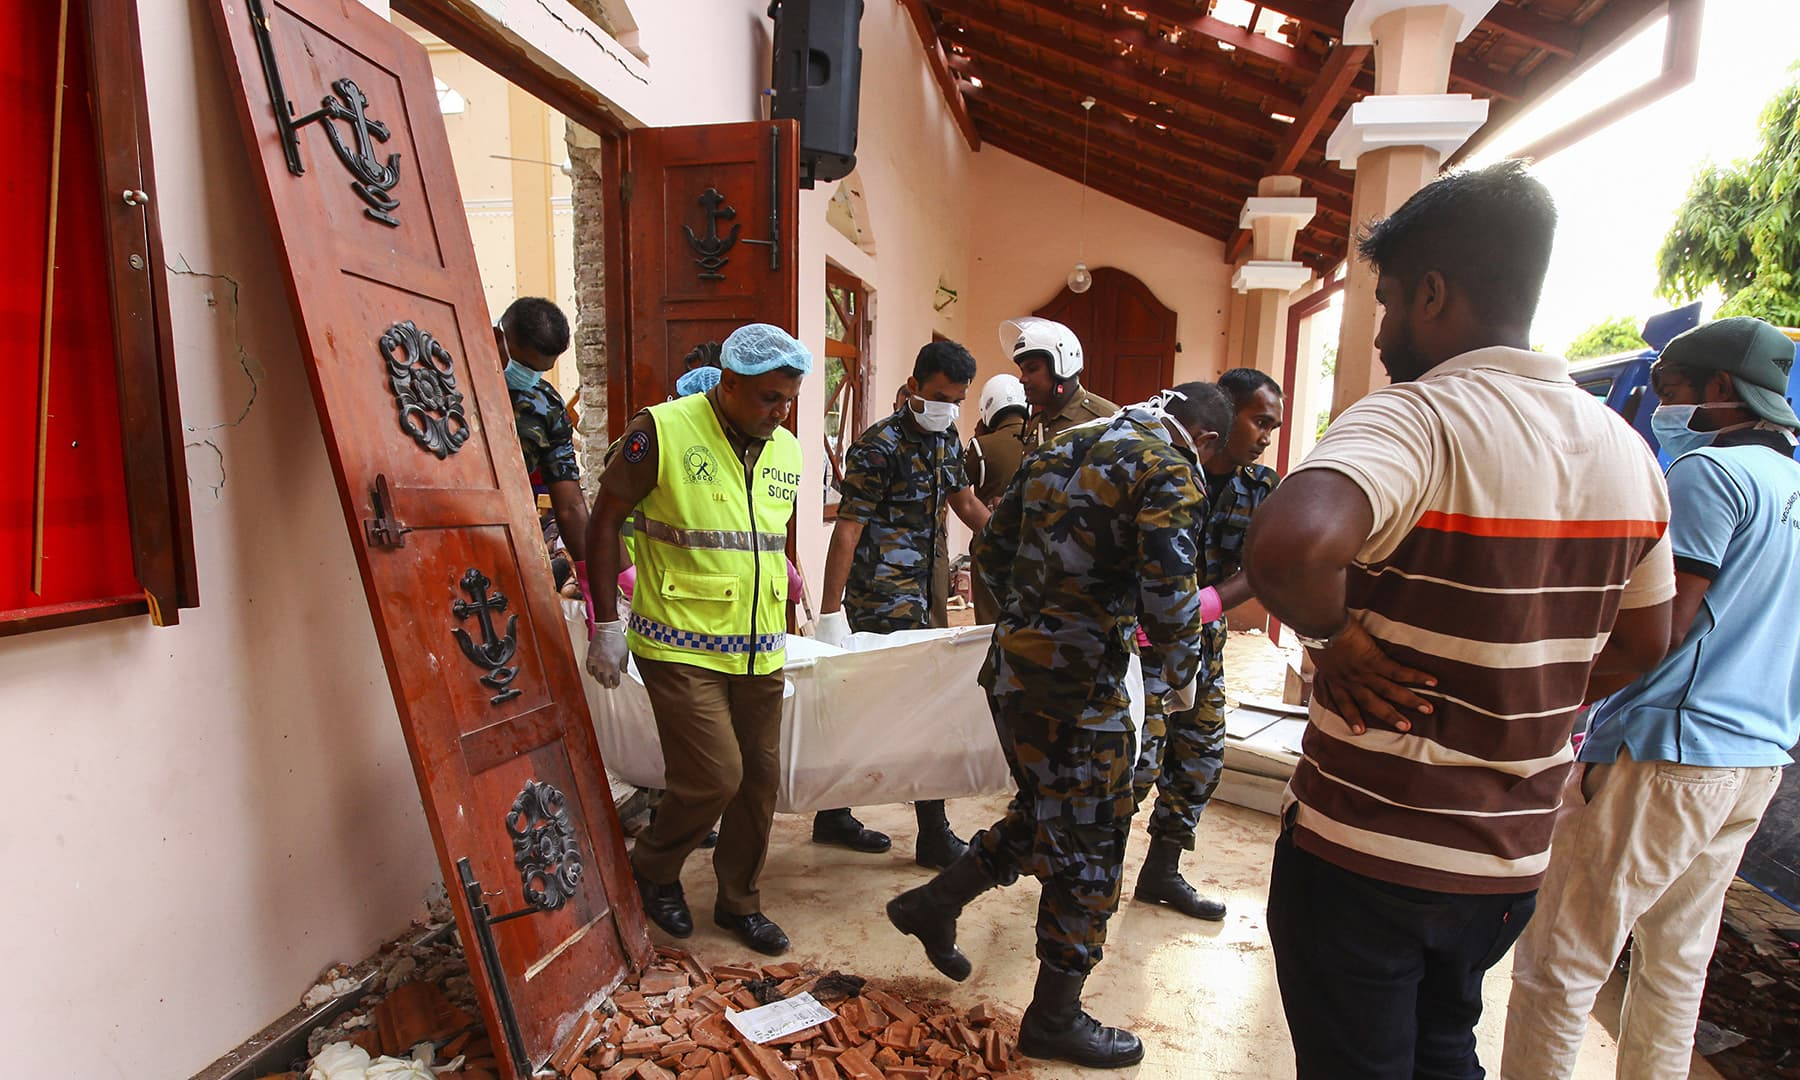 Sri Lankans carry a dead body at St. Sebastian's Church damaged in a blast in Negombo. — AP